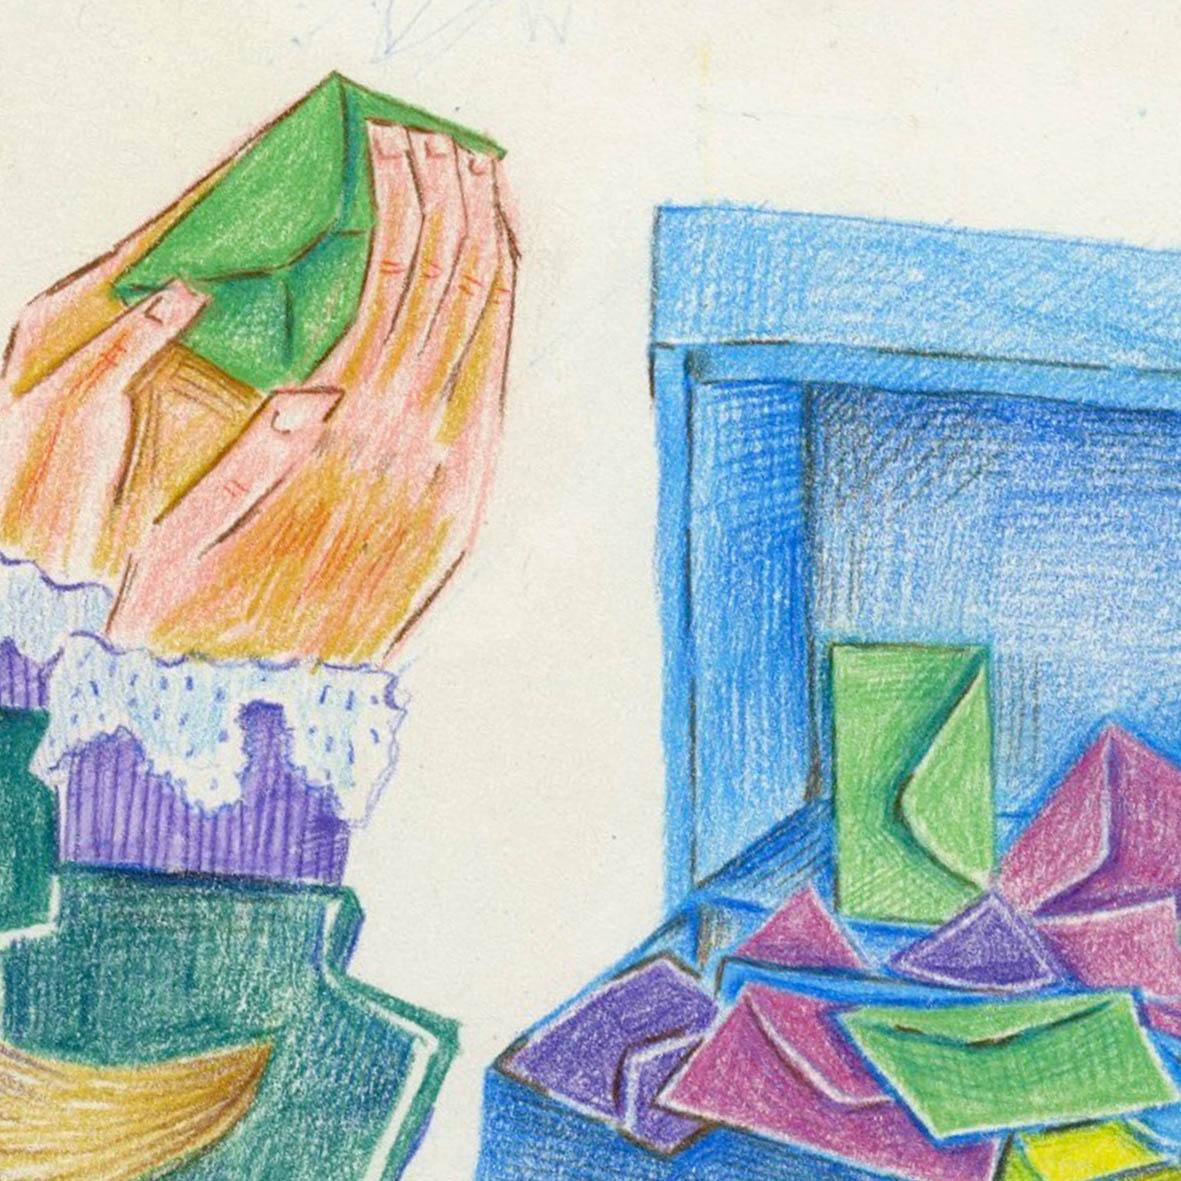 Gyeon, CD Guntee, just friend, illustration